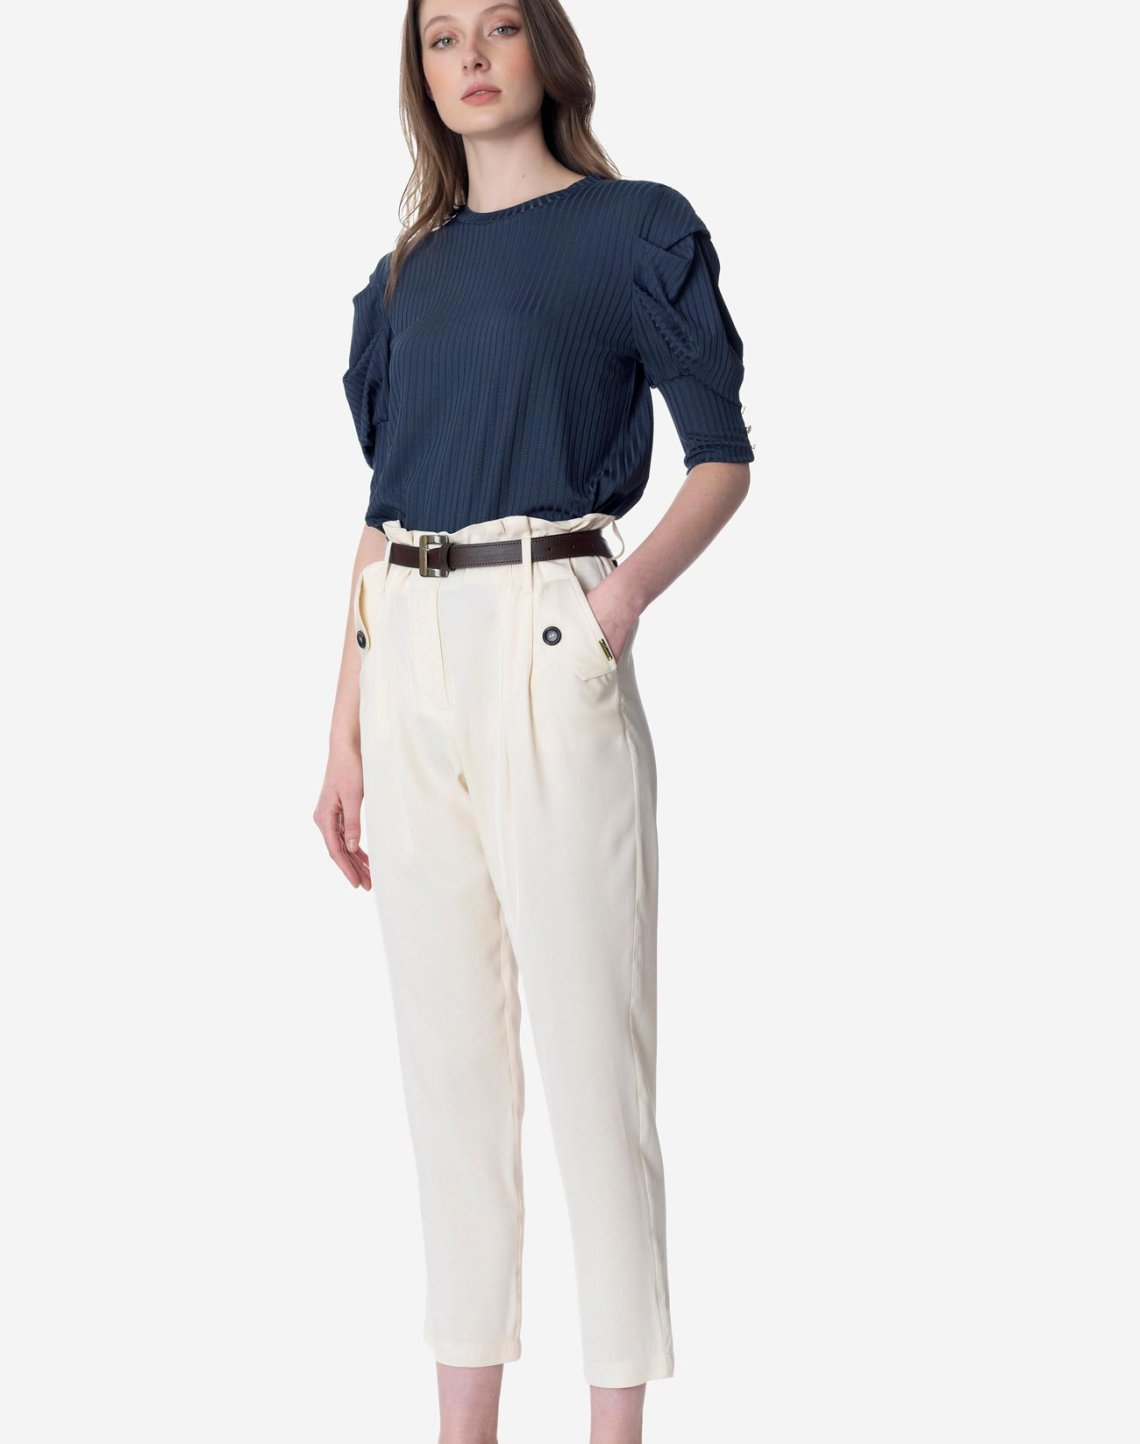 High-waist pleated trousers